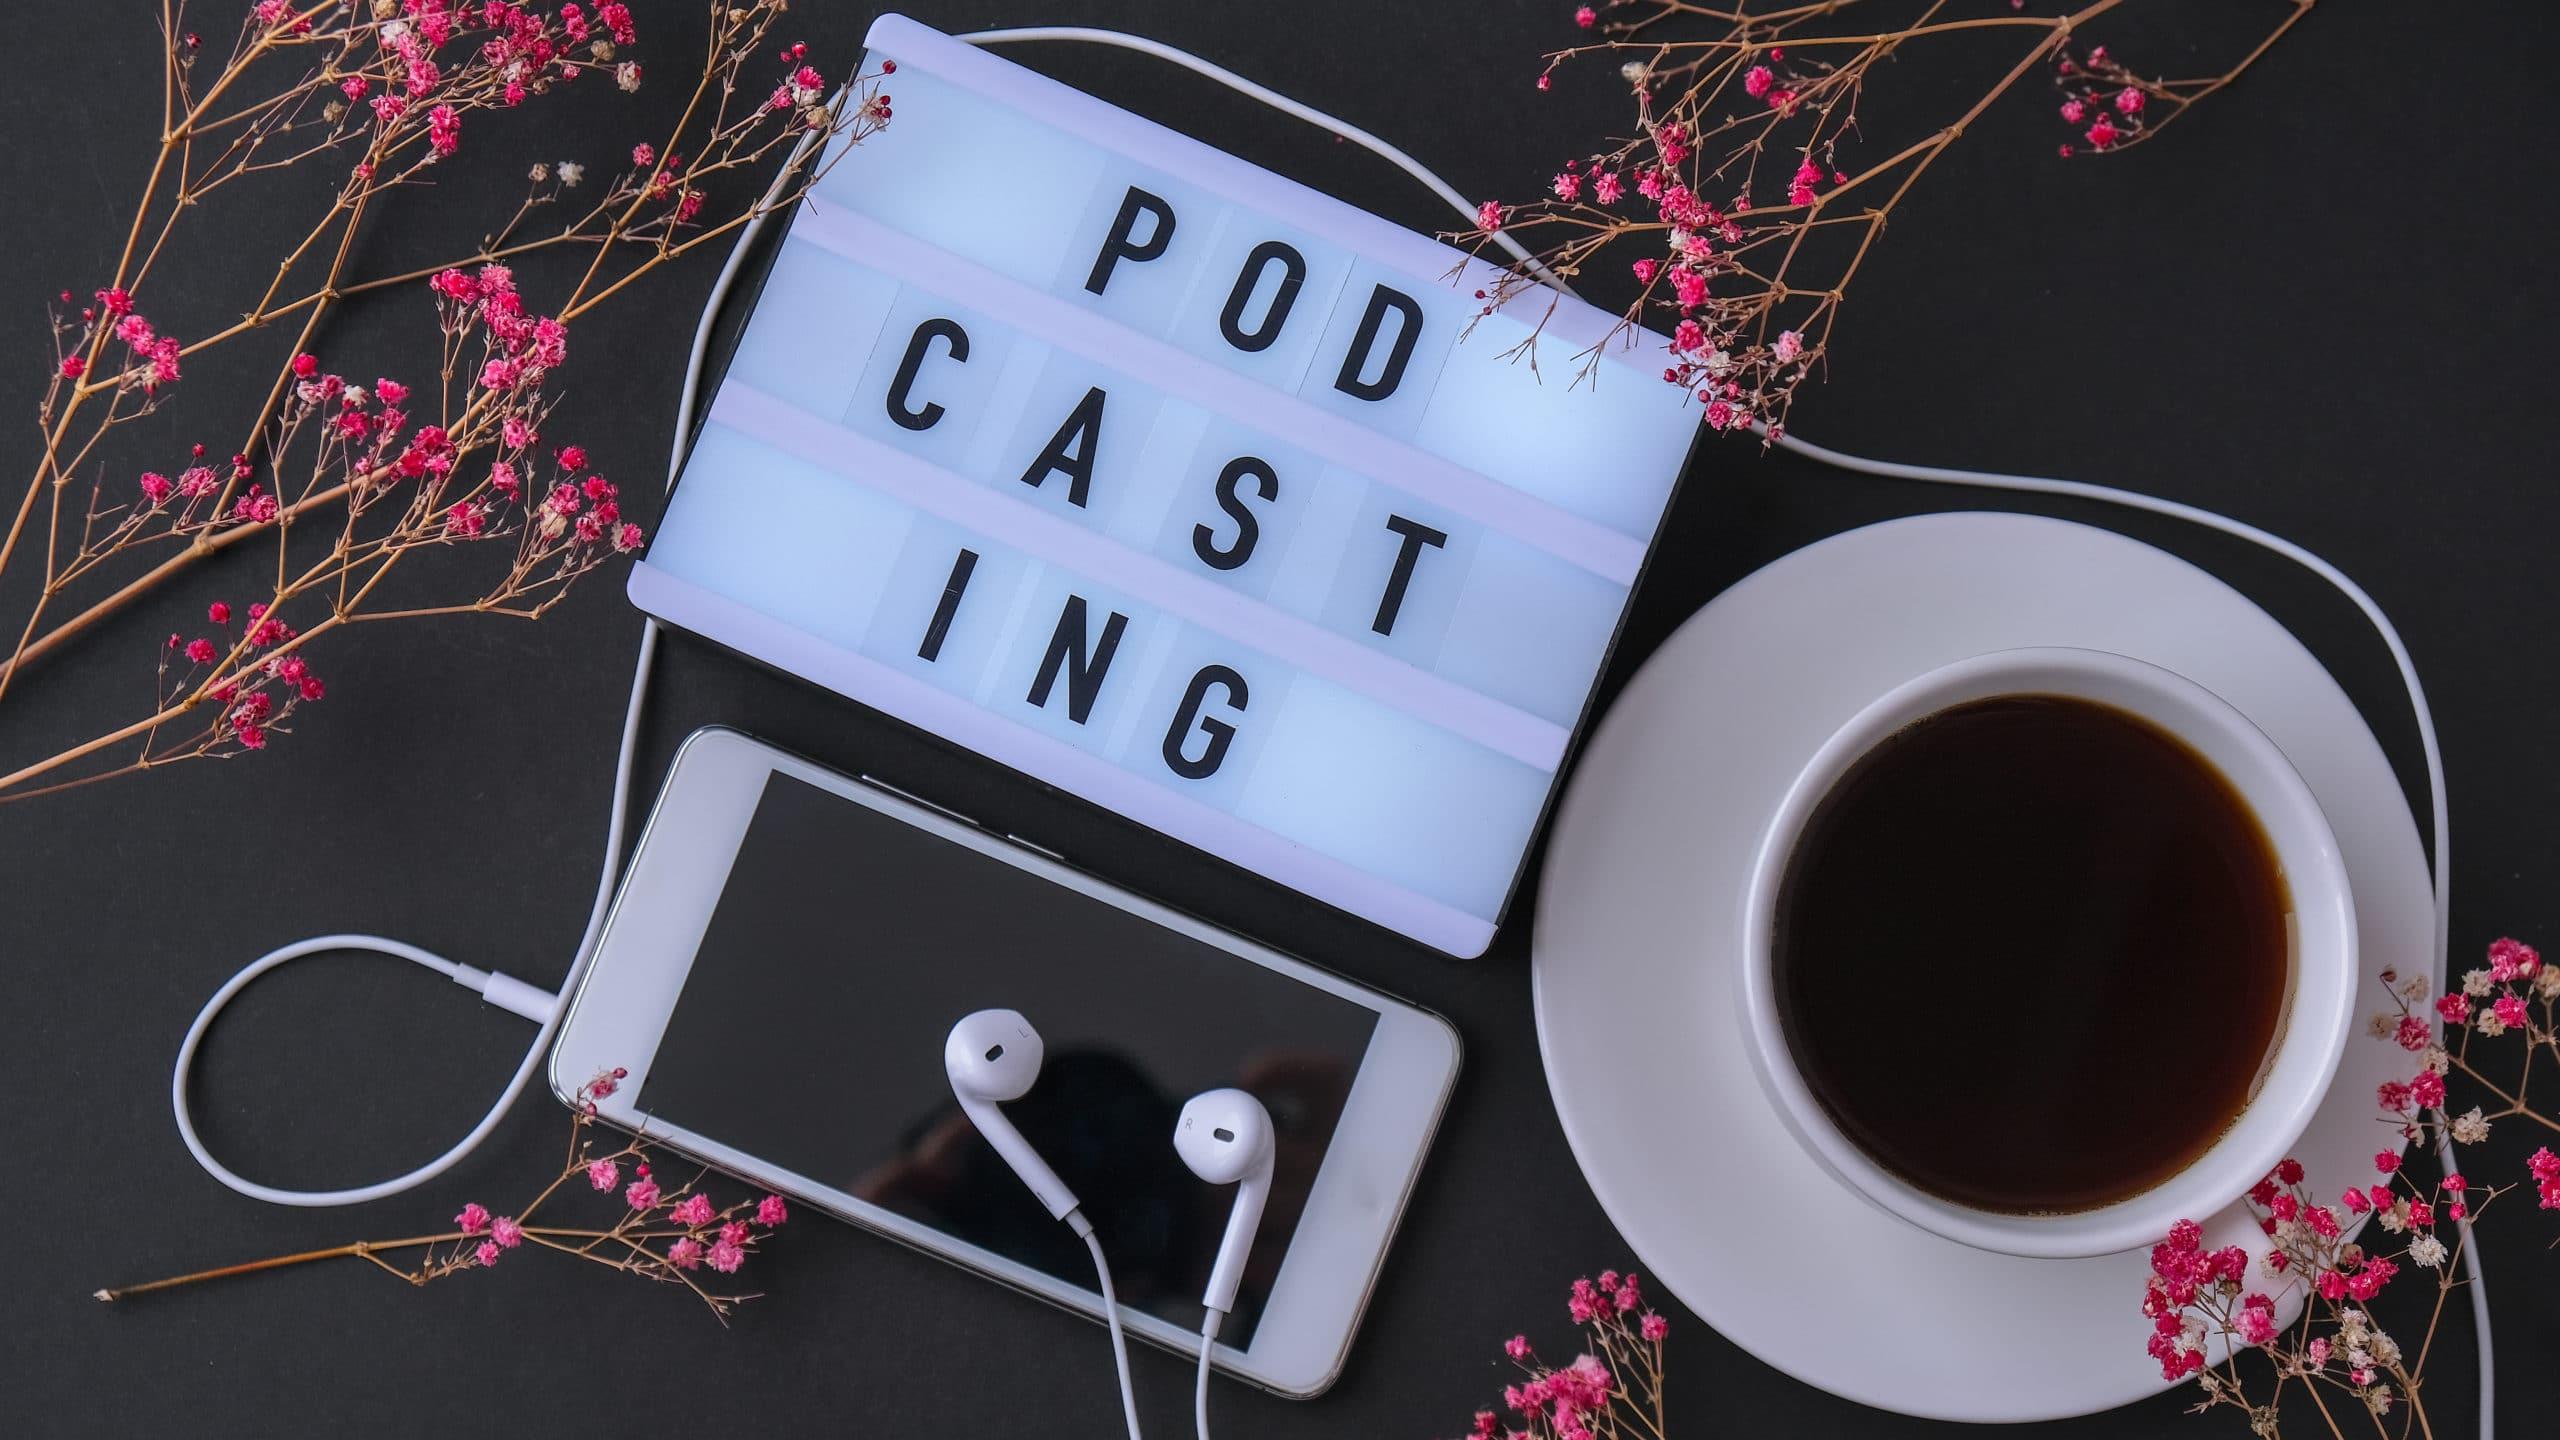 Podcast Opnemen